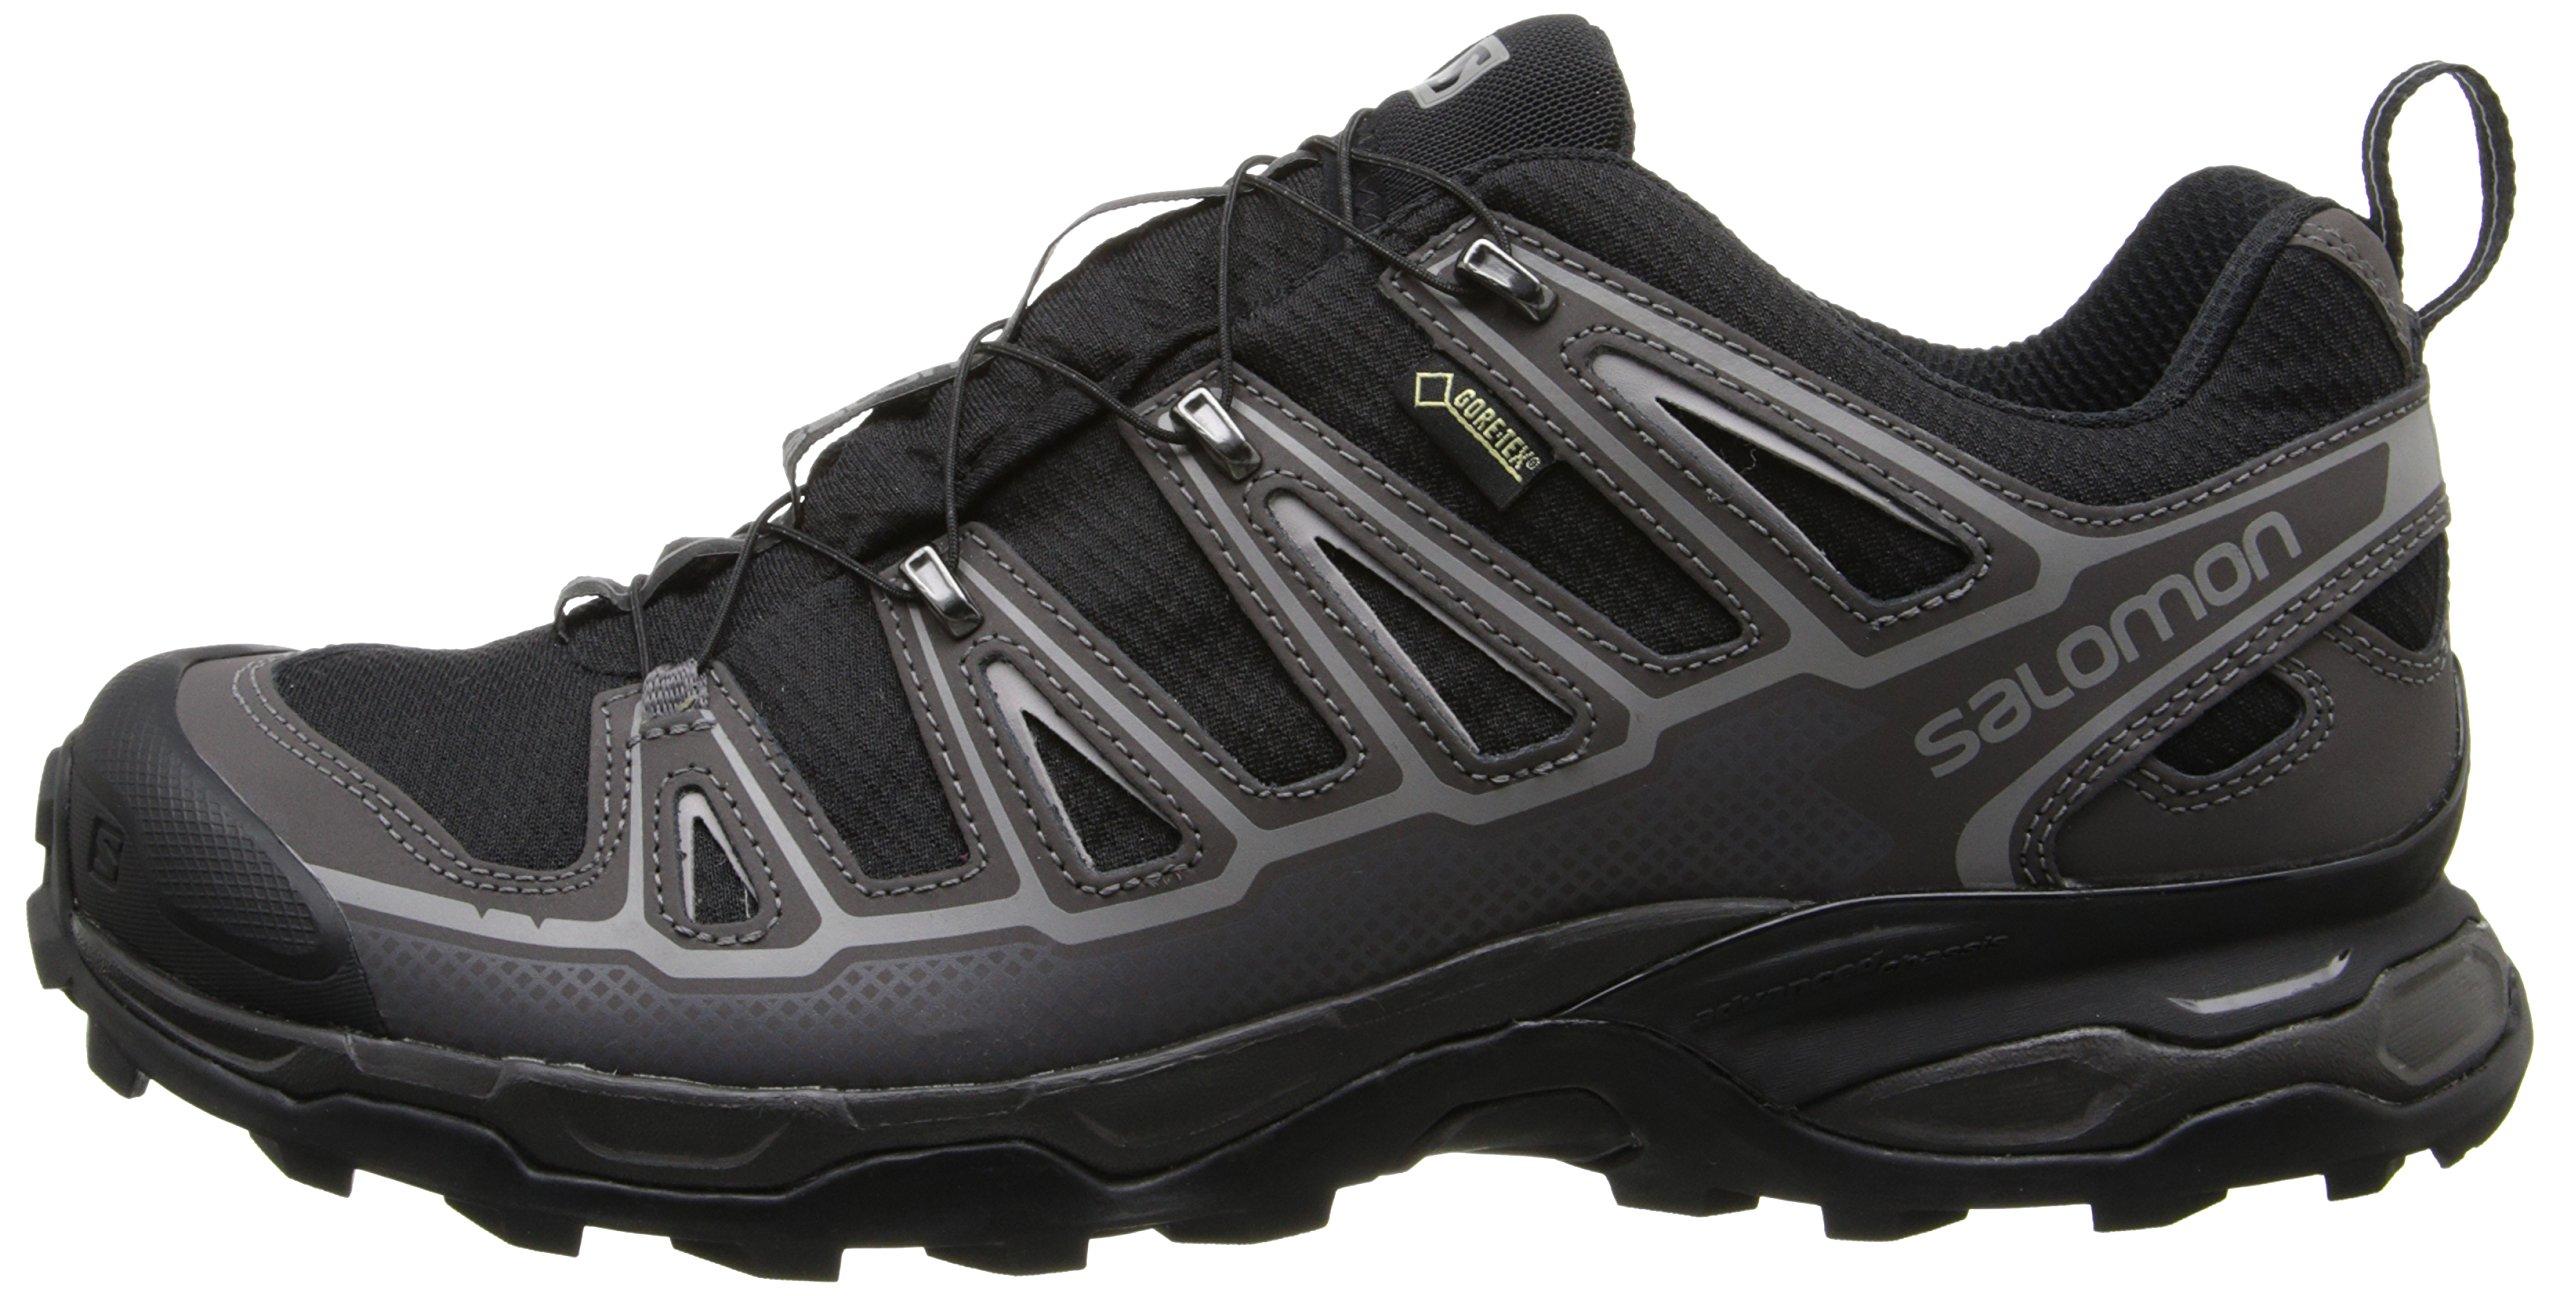 Salomon Men's X Ultra 2 GTX Hiking Shoe, Black/Autobahn/Aluminum, 7 M US by Salomon (Image #5)